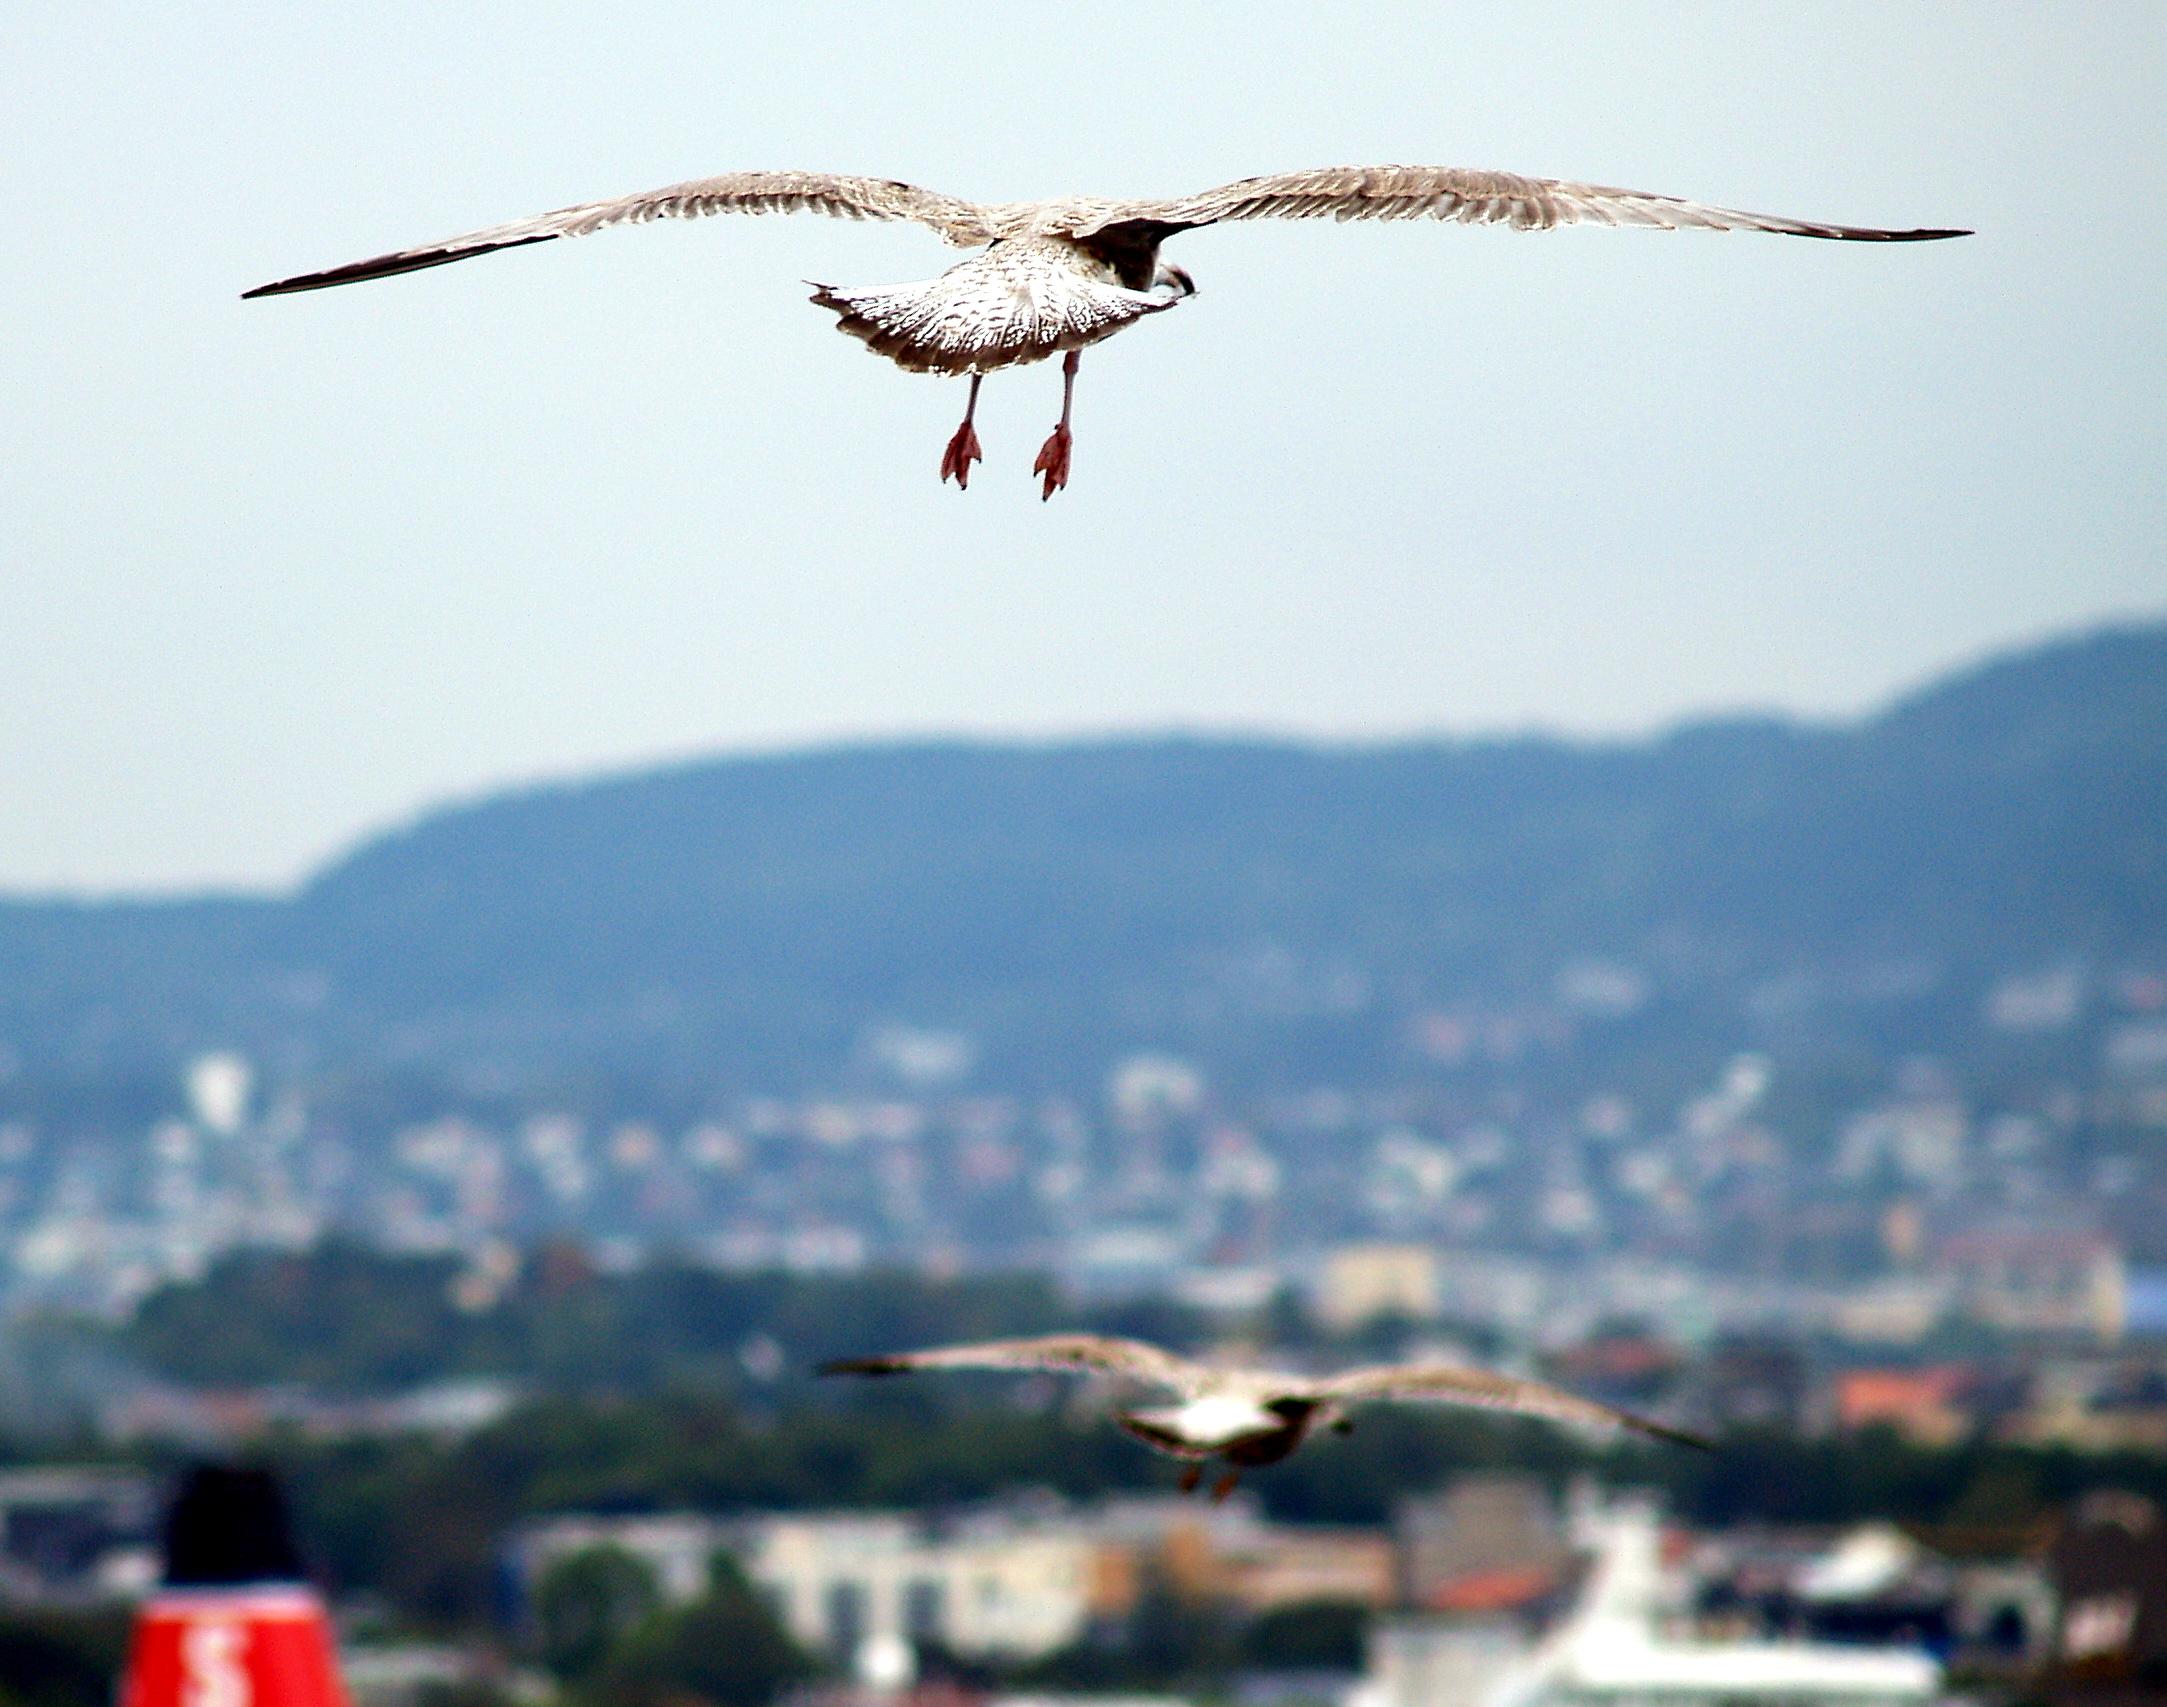 Oslo - 78 gulls